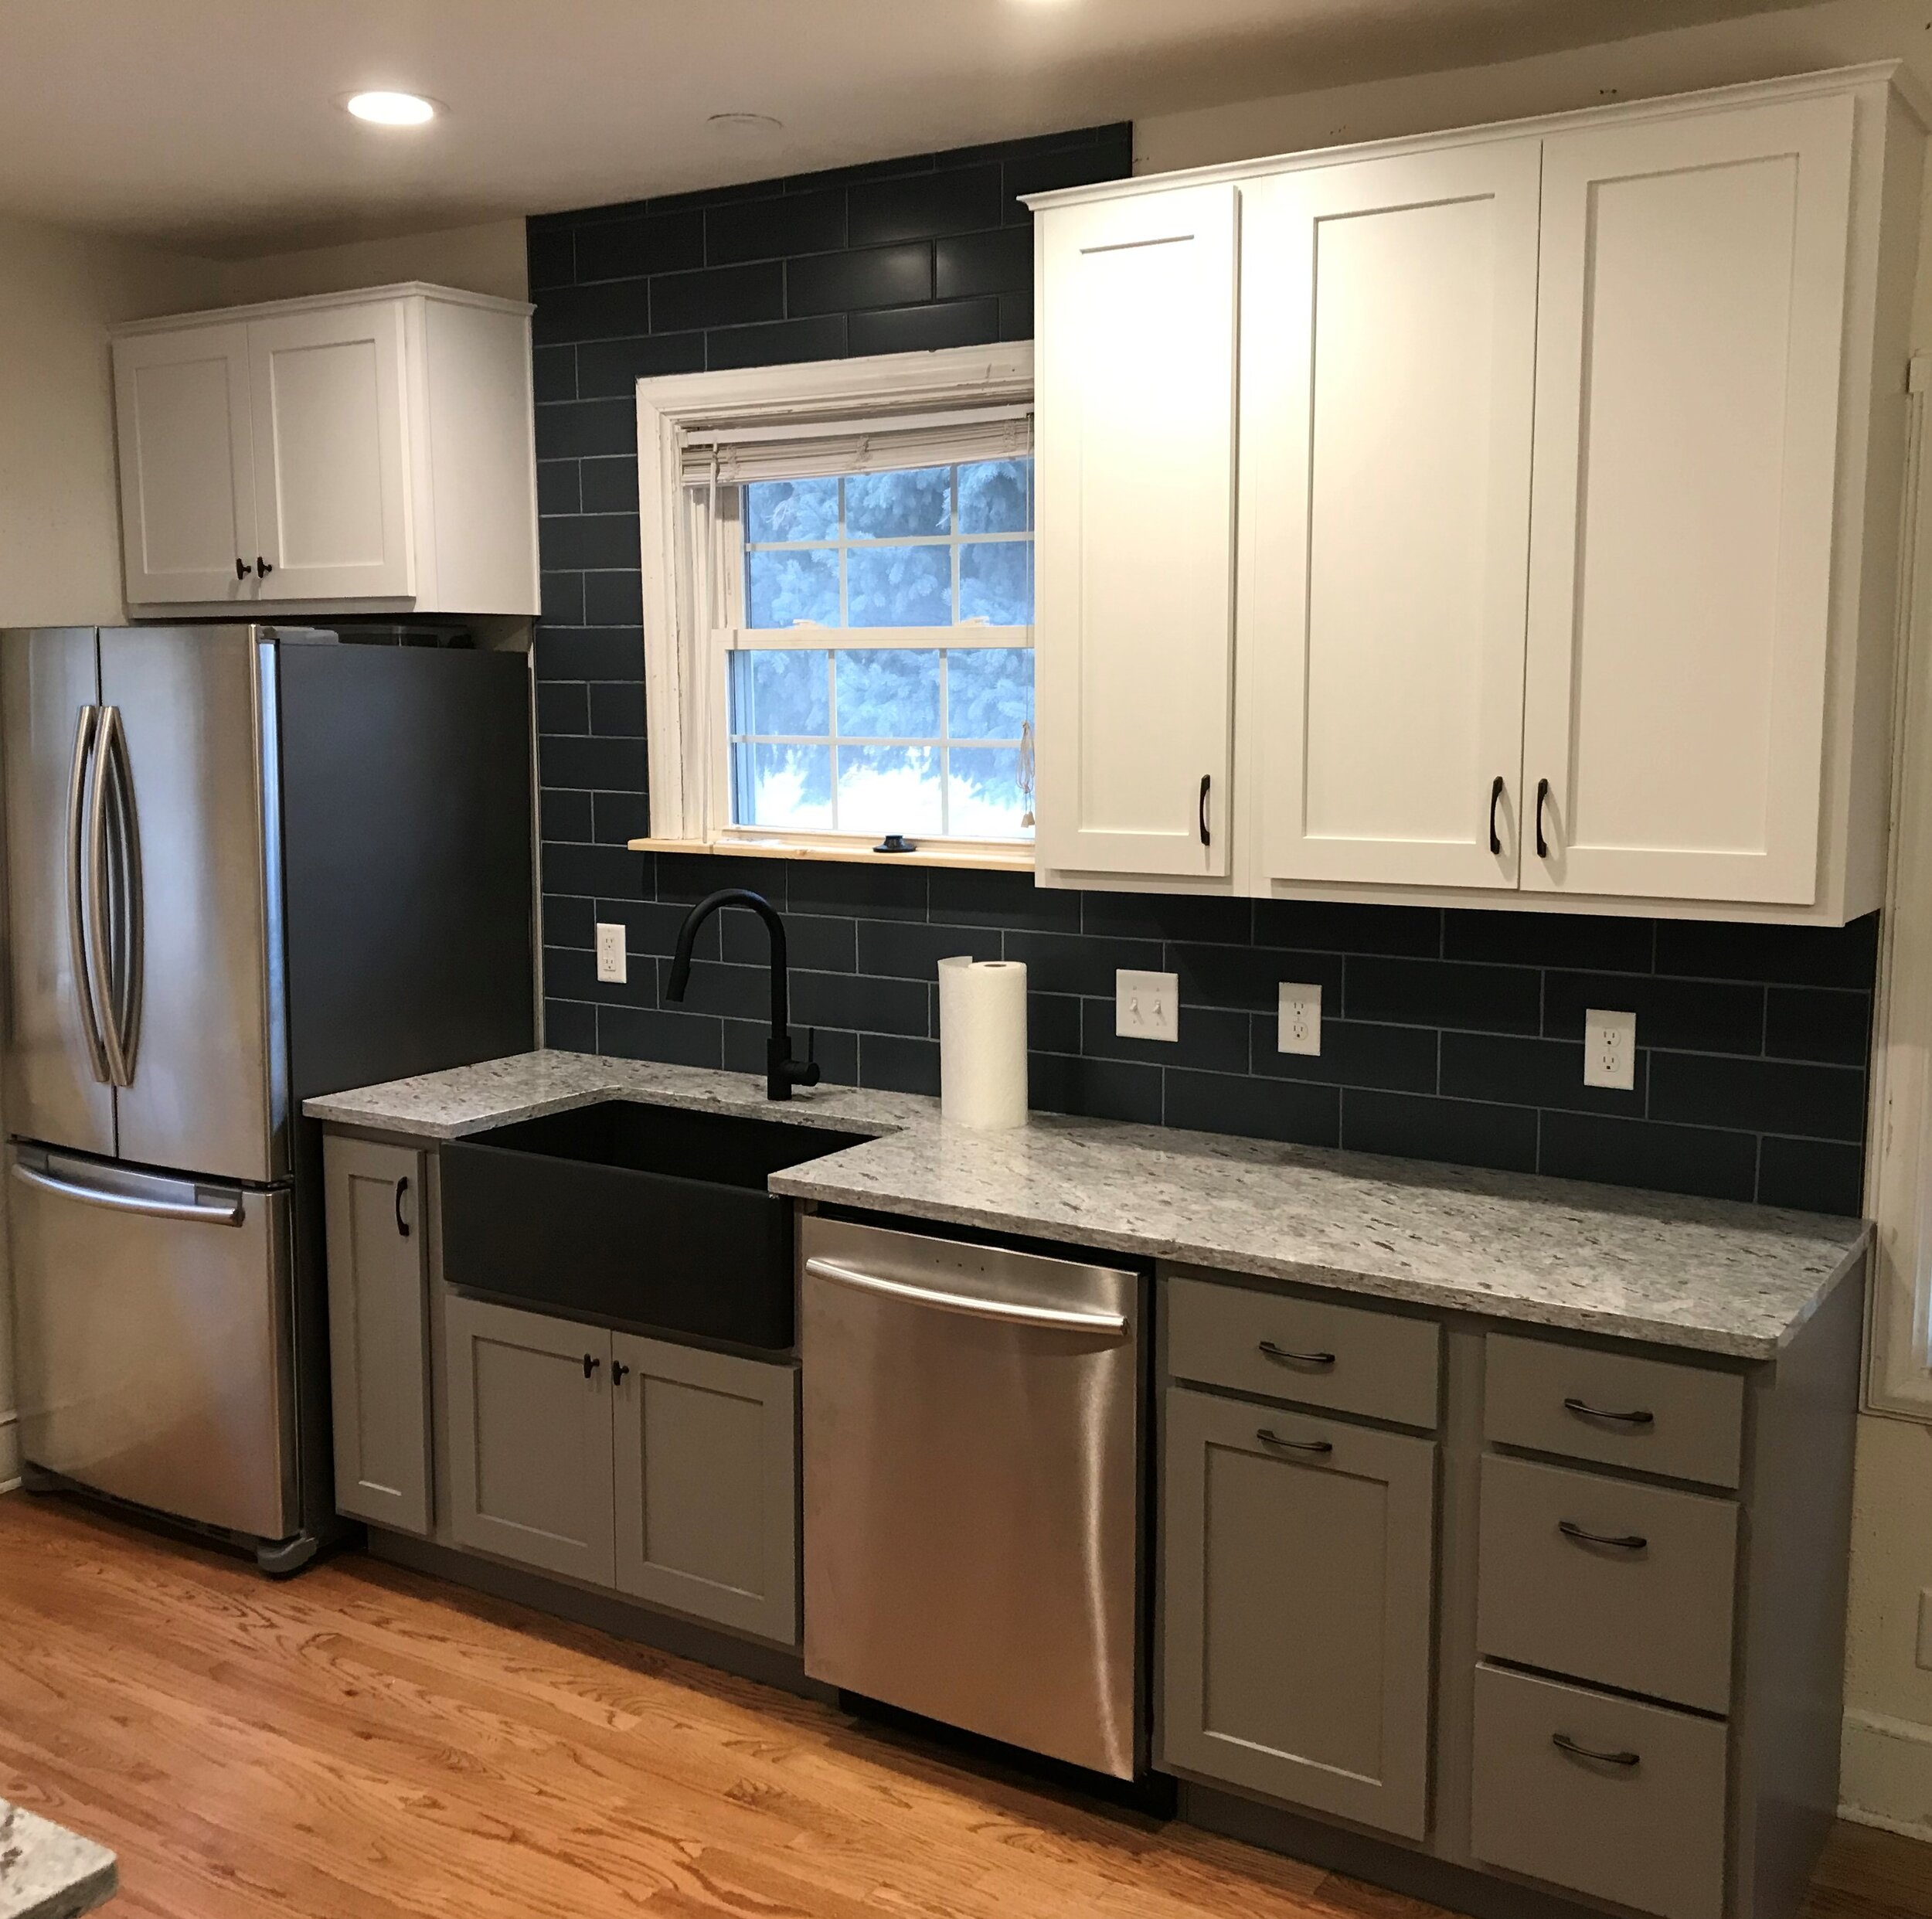 Tiny Kitchen Remodel Deloa Sons Construction Inc